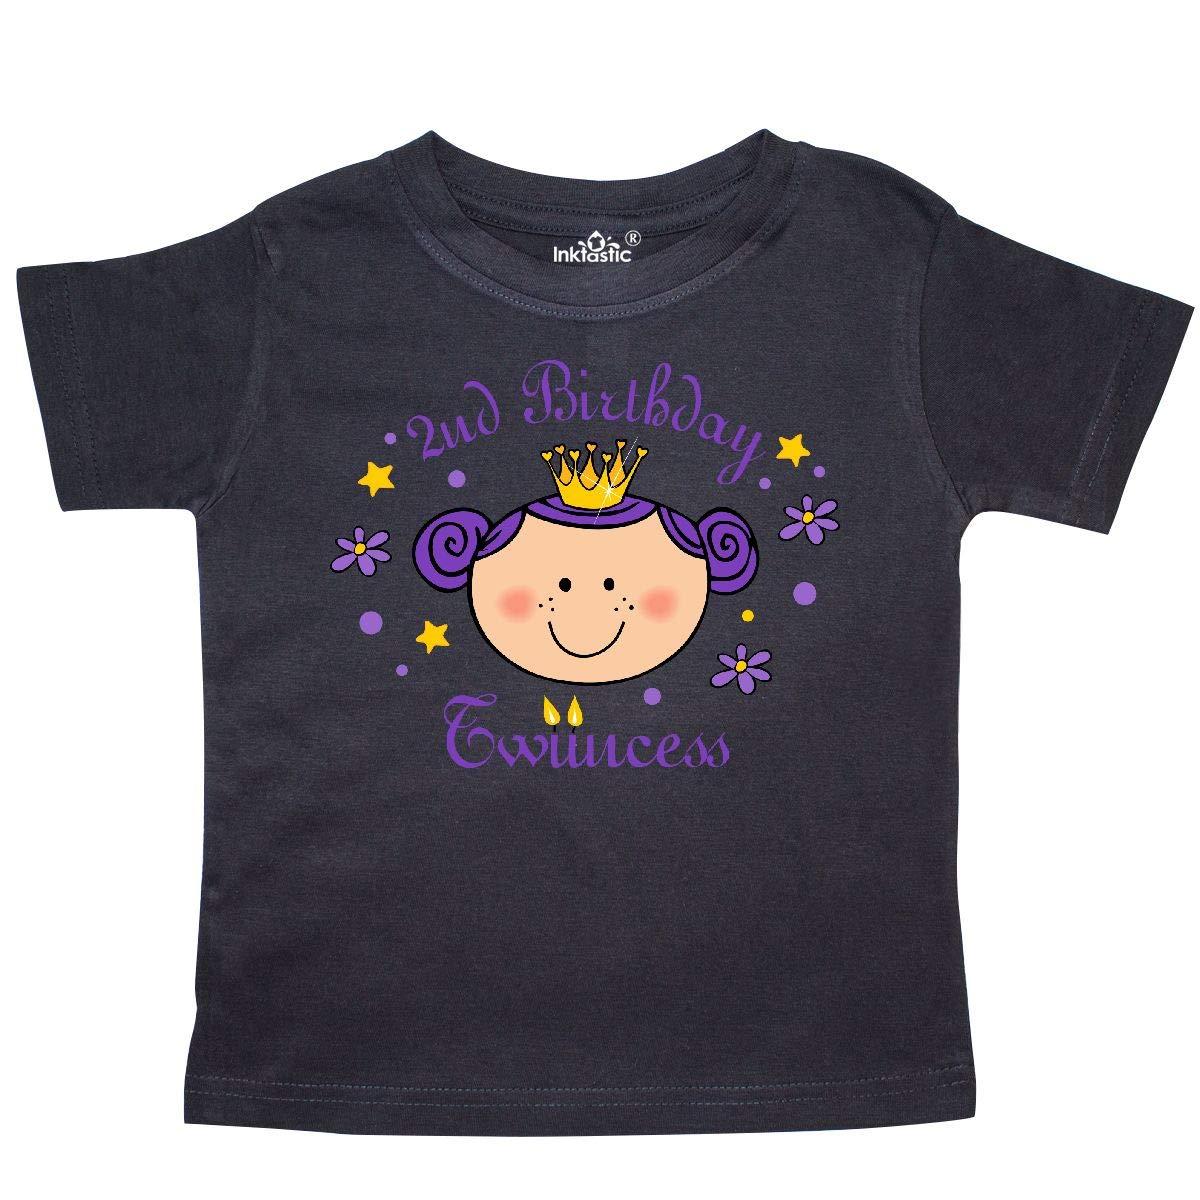 inktastic 2nd Birthday Twincess Toddler T-Shirt